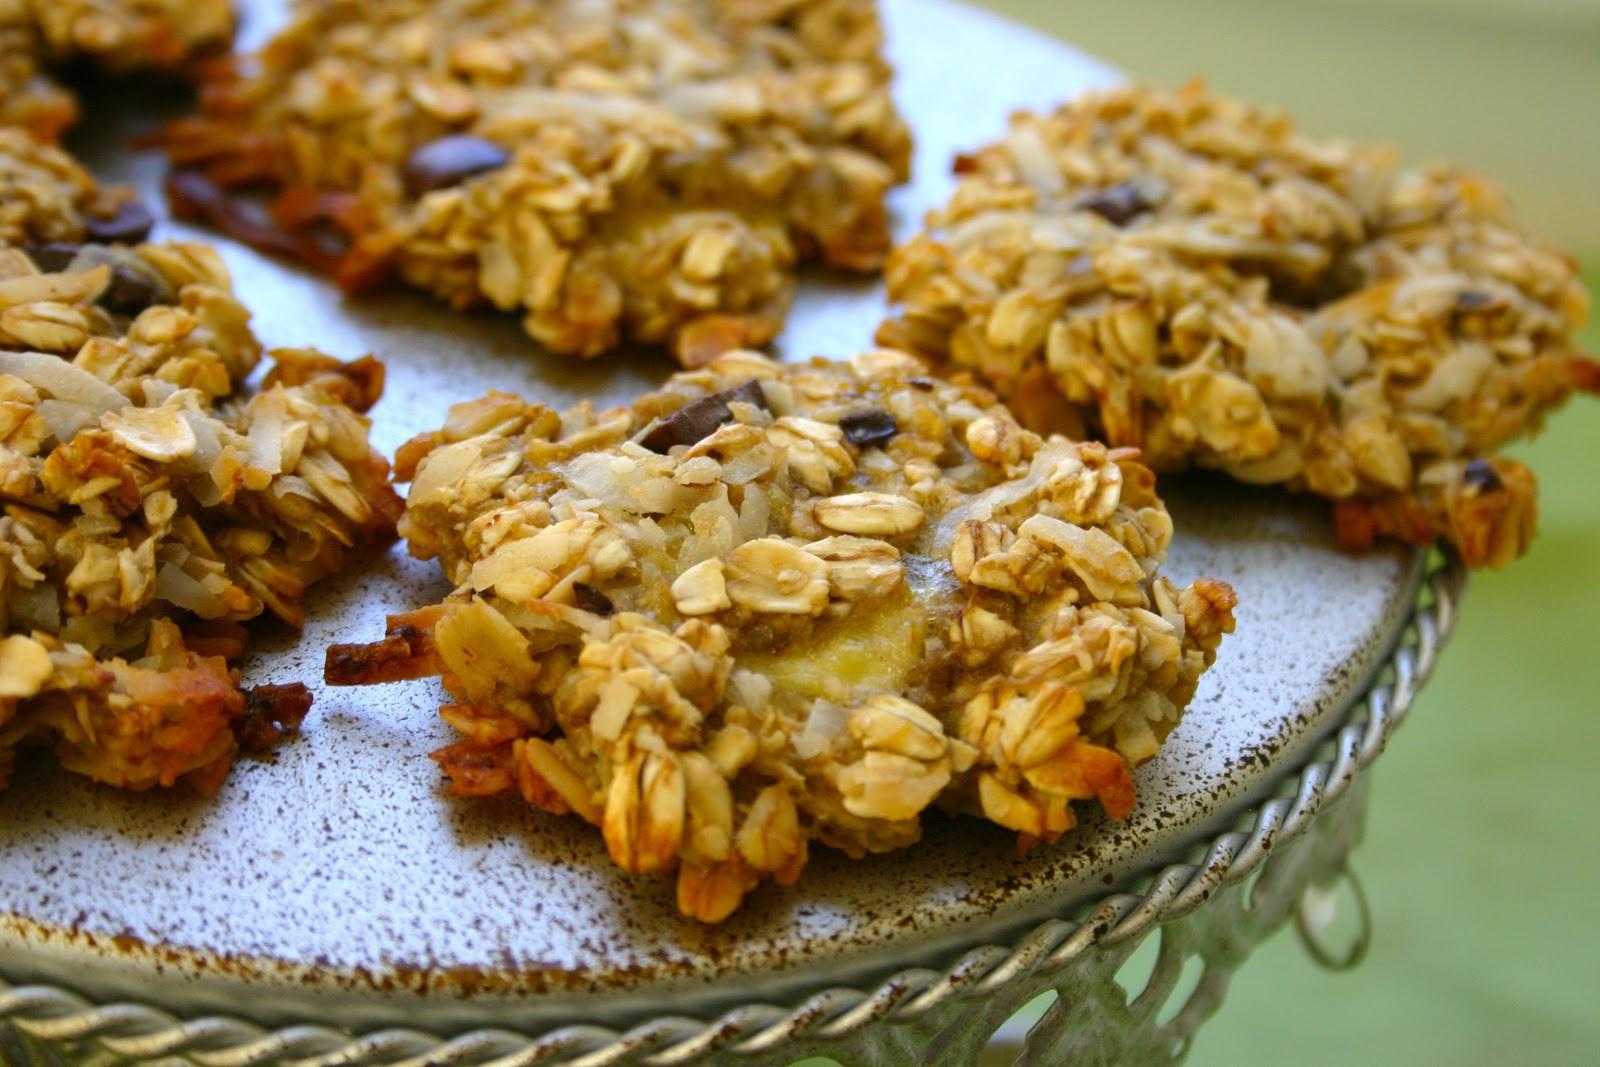 Healthy No Bake Banana Oatmeal Cookies  7 Top Healthy Snacks That Are Good For Diabetics – Nigeria